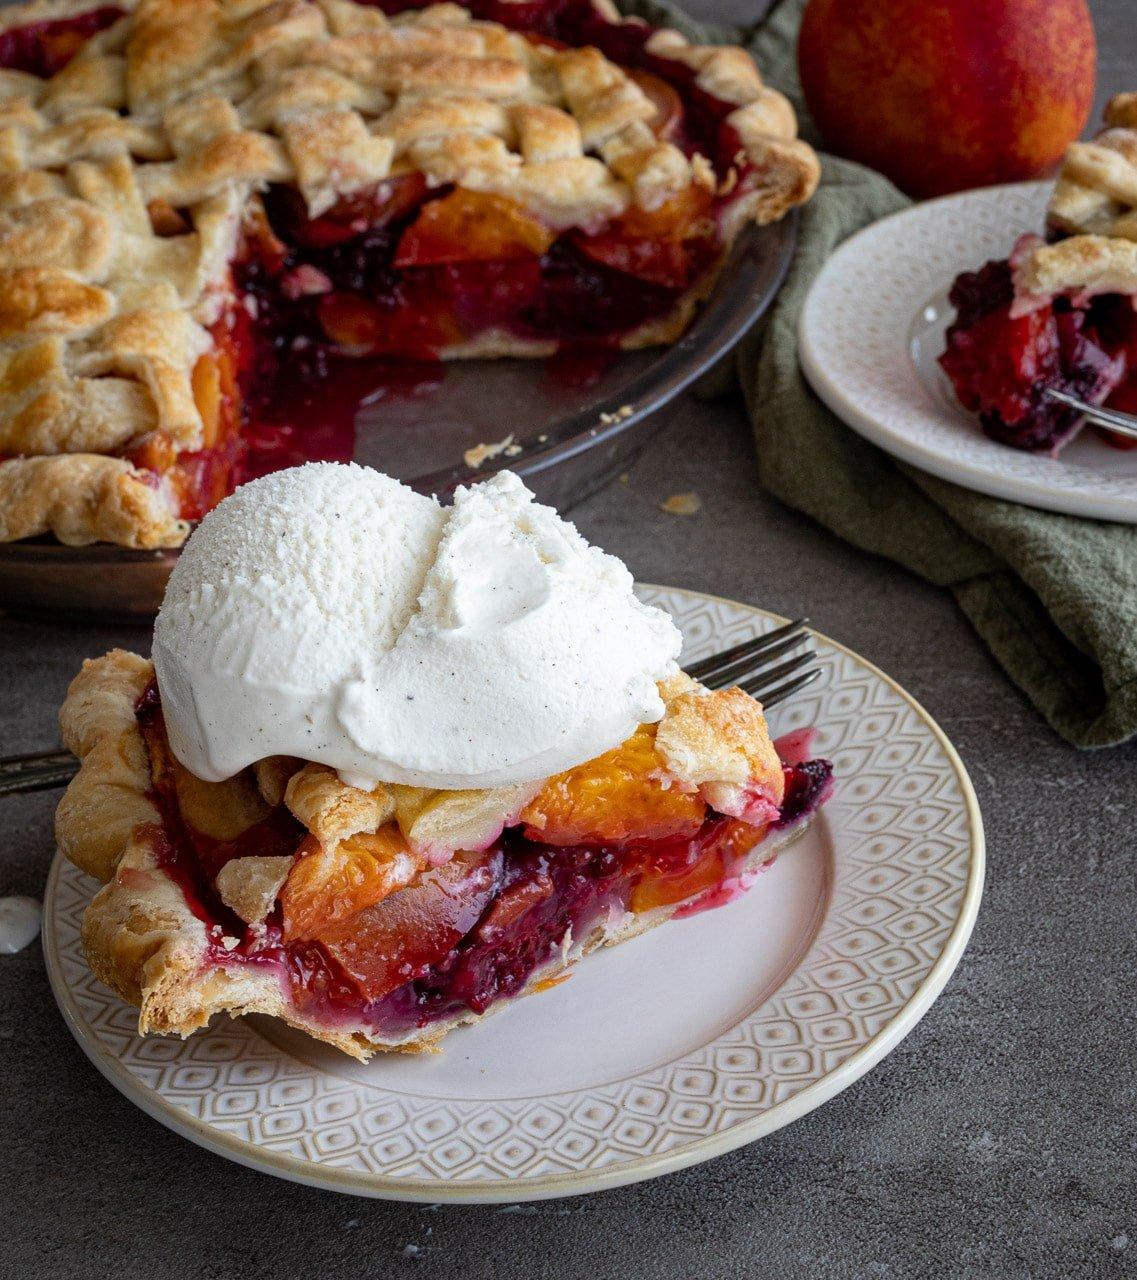 Nectarine and Blackberry Homemade Pie slice on a plate with vanilla ice cream